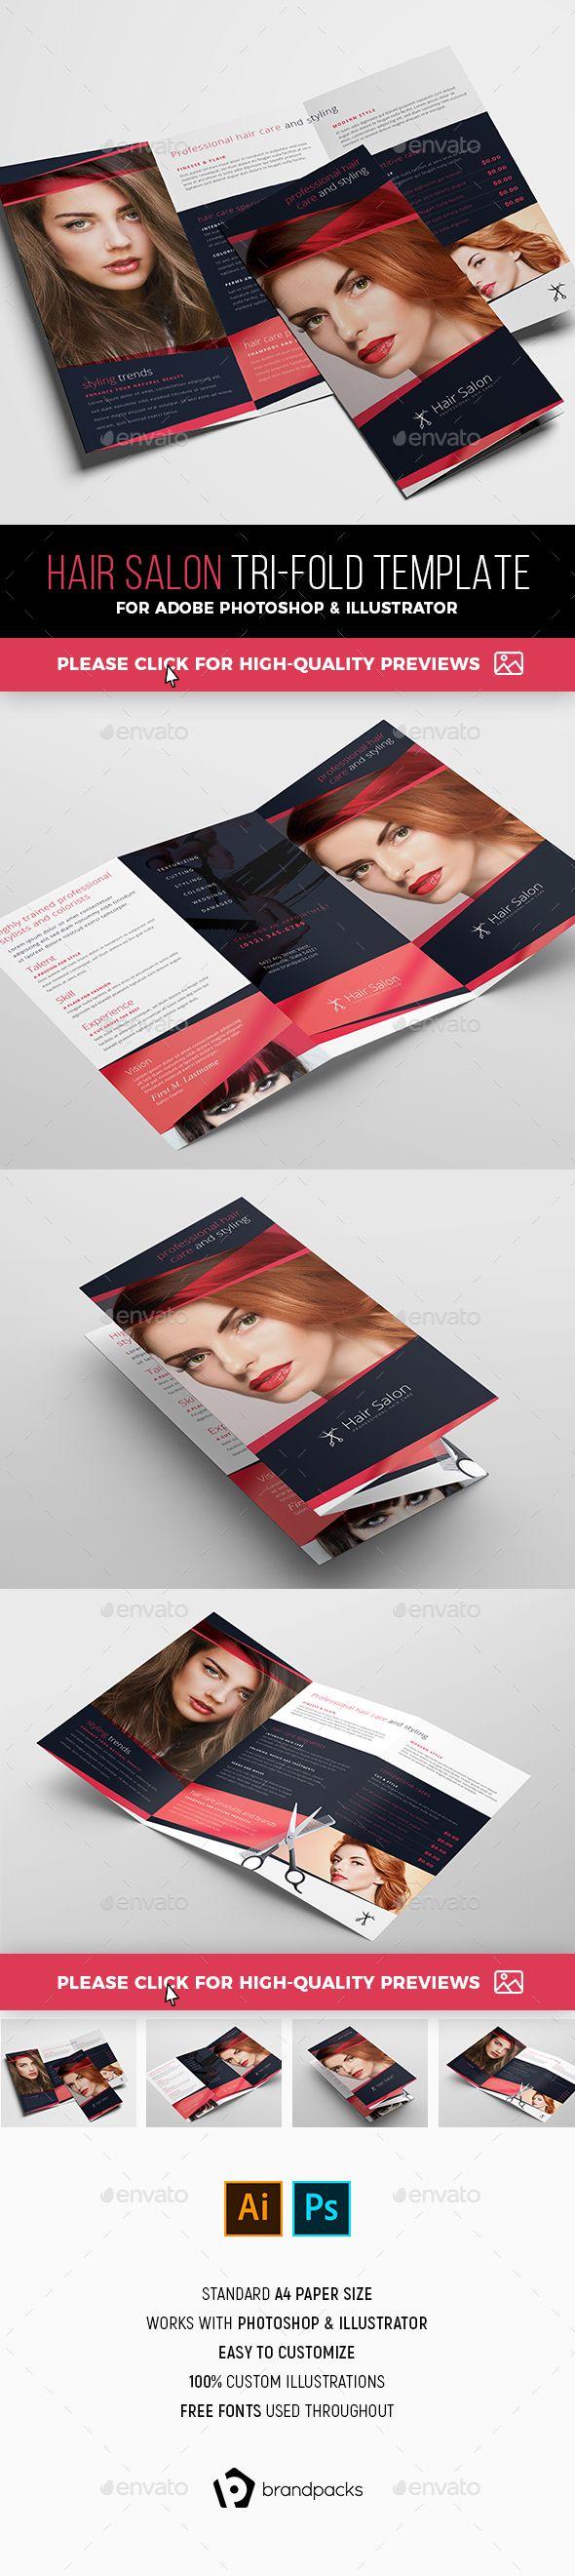 Hair Salon Tri-Fold Brochure Template PSD, AI #design ...